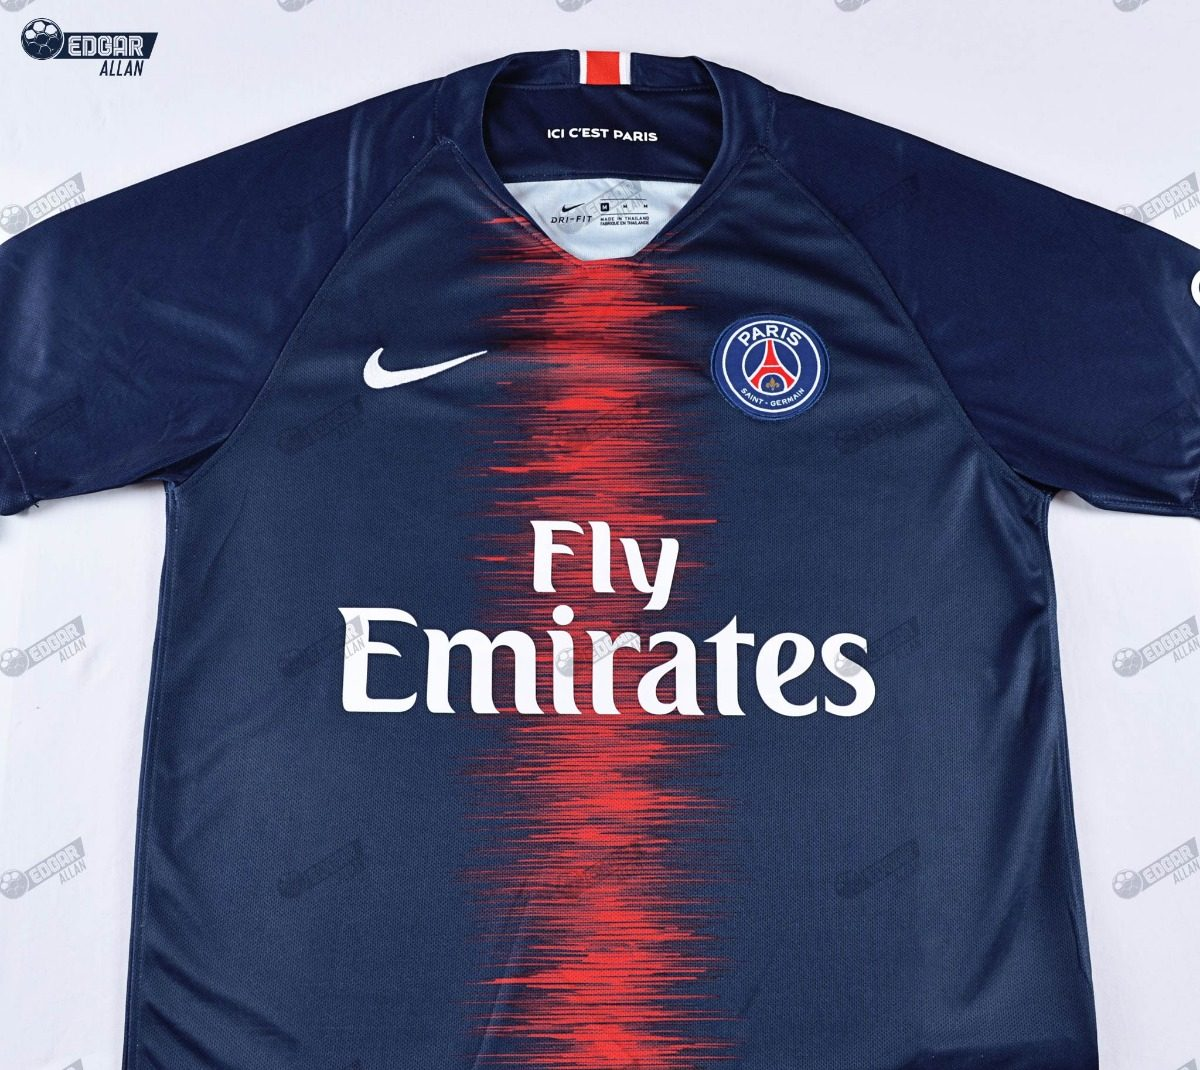 41294389d nueva camiseta psg 18-19 paris saint germain mbappe neymar. Cargando zoom.